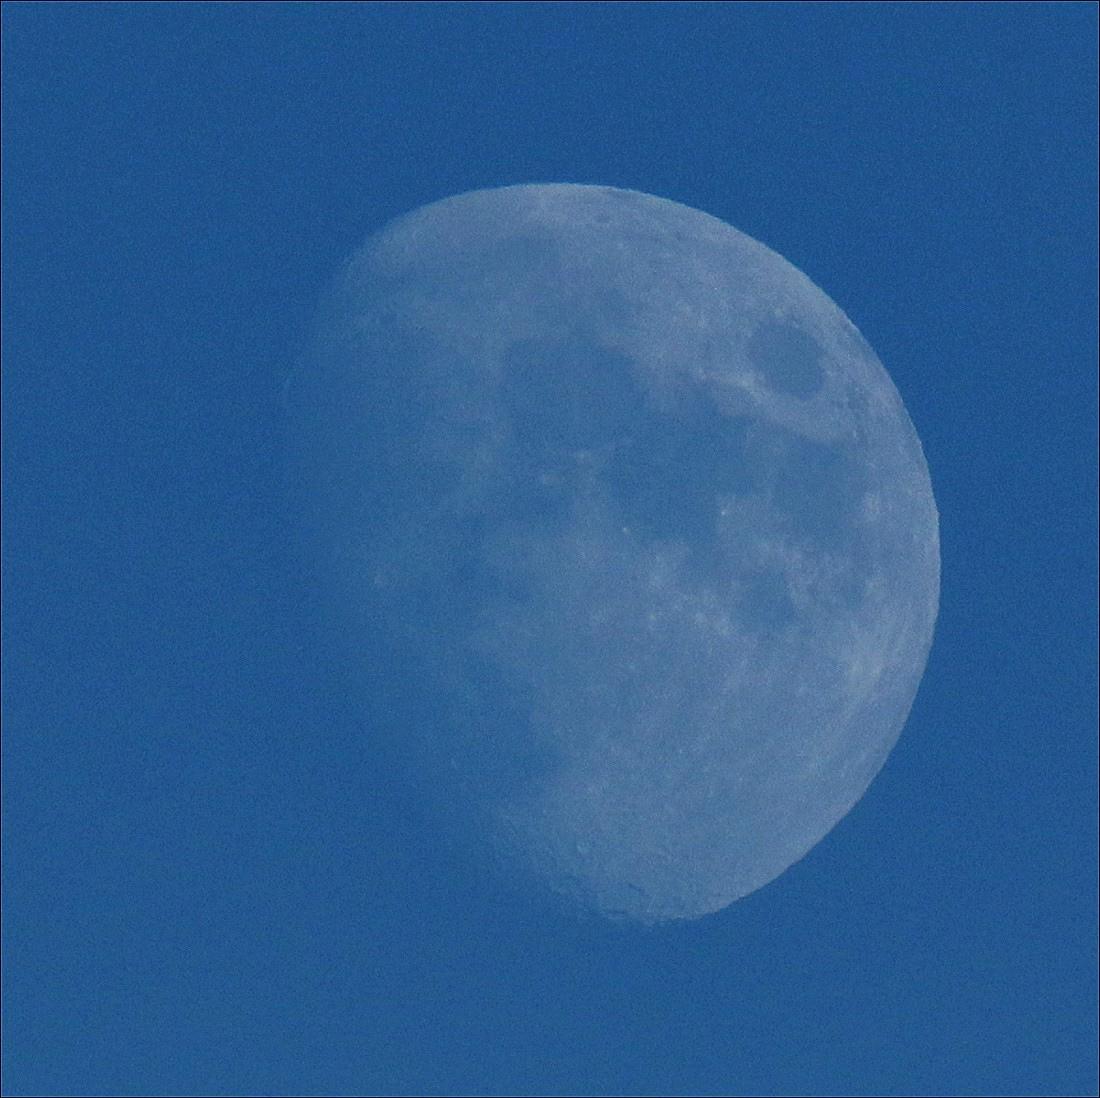 la lune le 09/09/2019 (41128 R6 2)